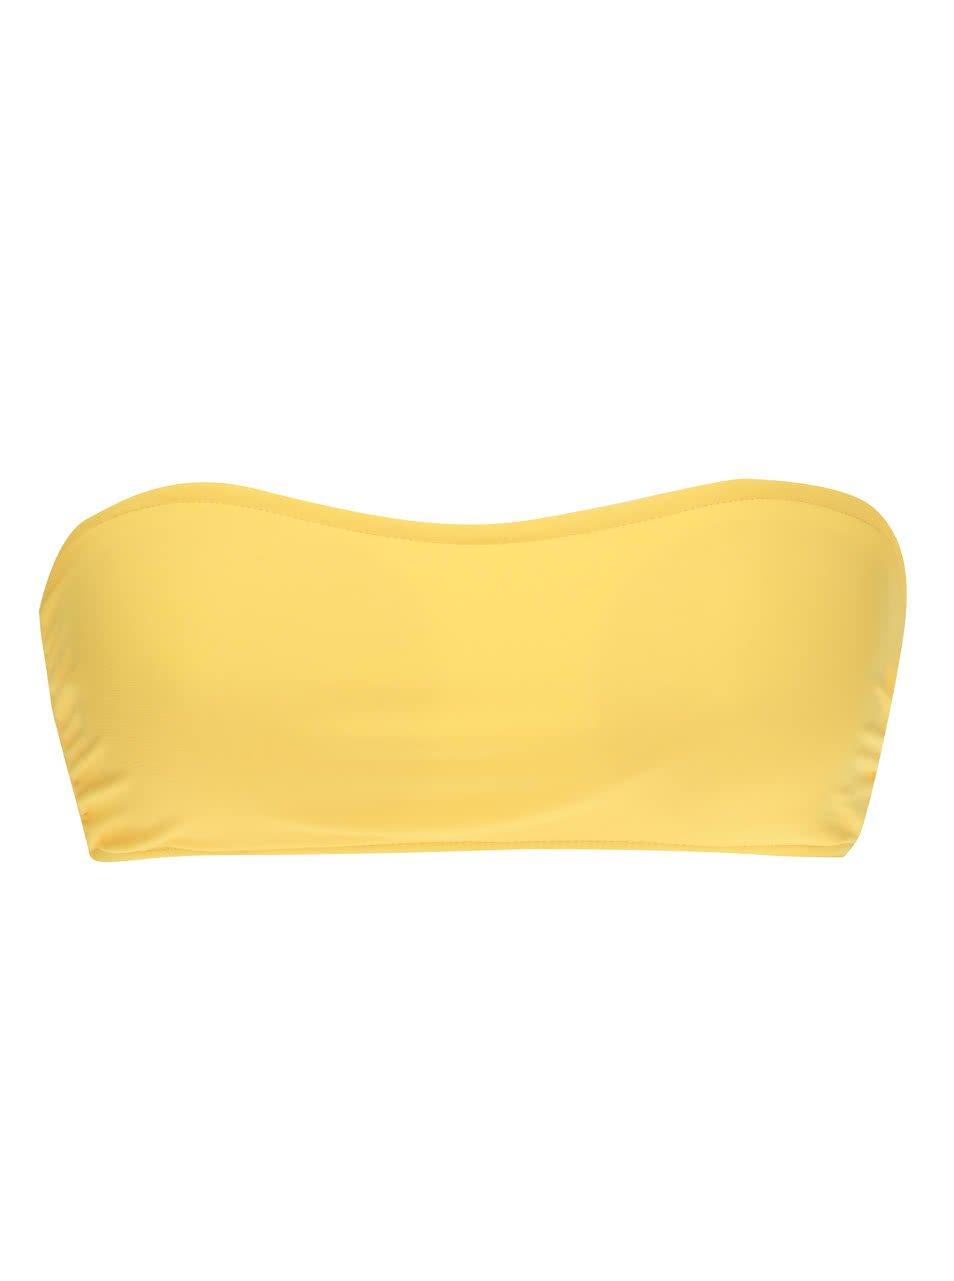 Žlutý vrchní díl plavek bez ramínek VERO MODA Marie